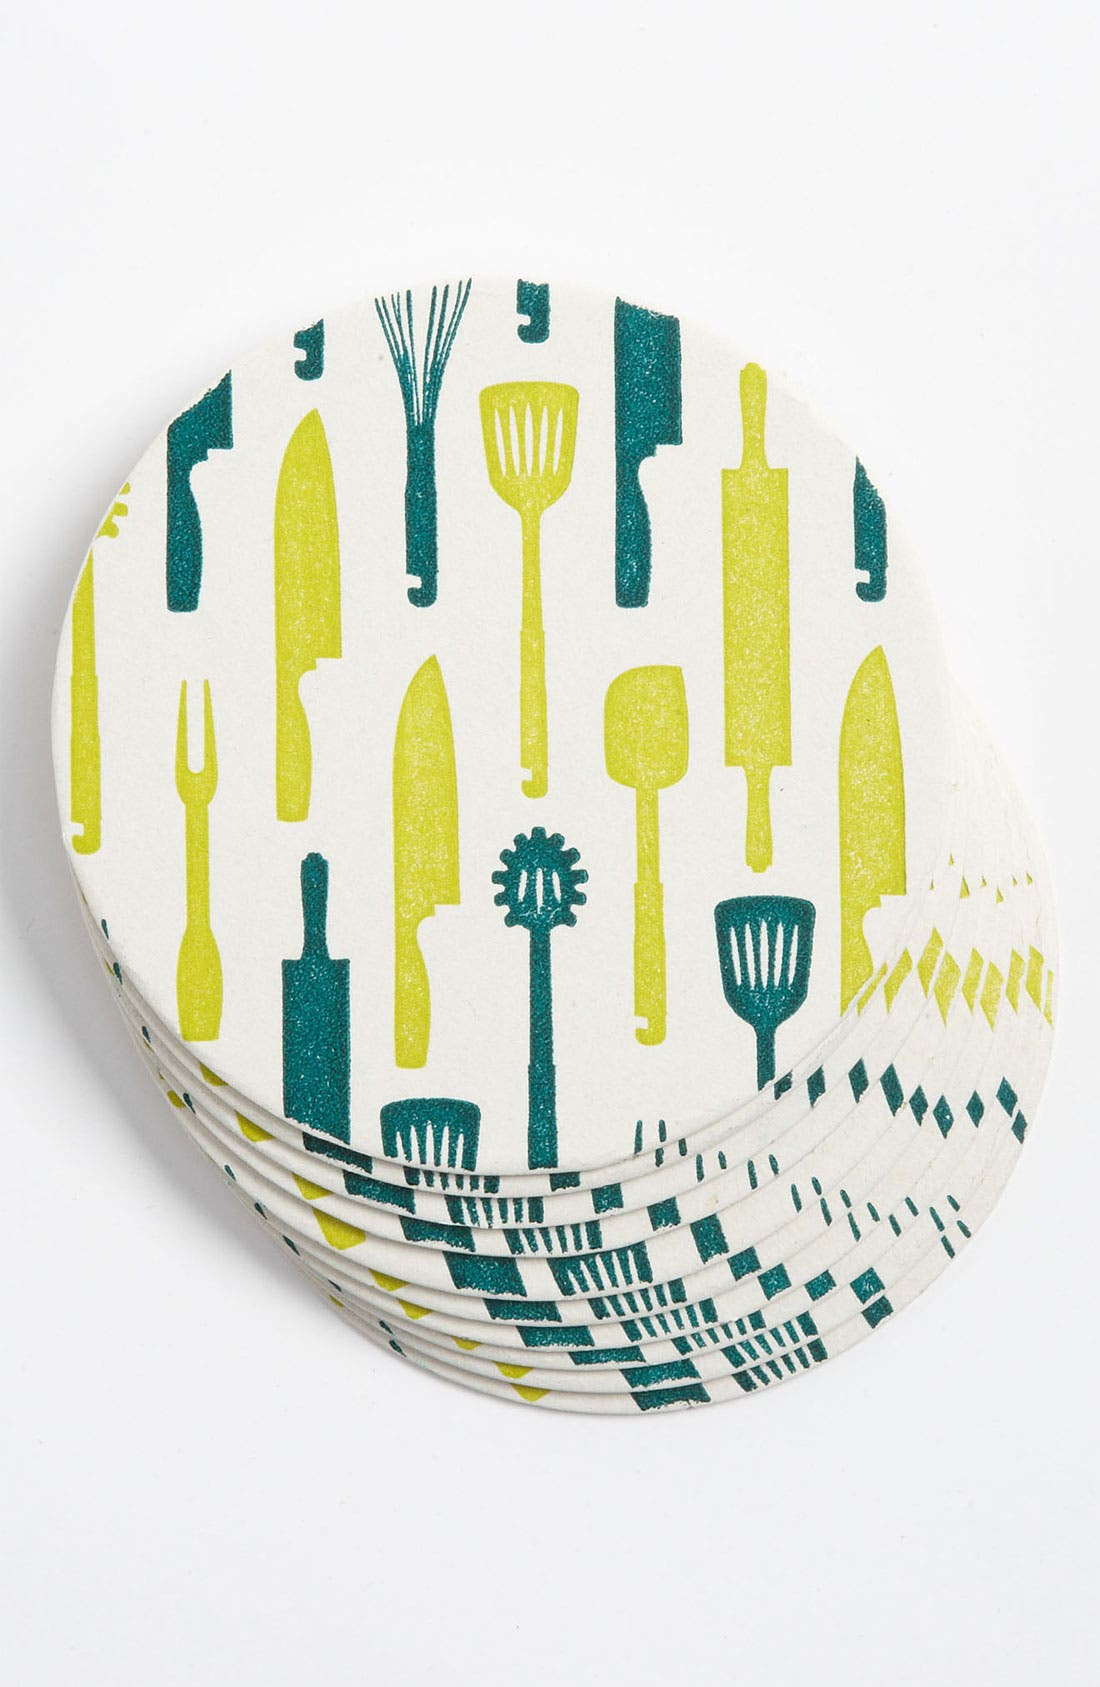 Alternate Image 1 Selected - 'Kitchen Utensils' Letterpress Coasters (Set of 10)